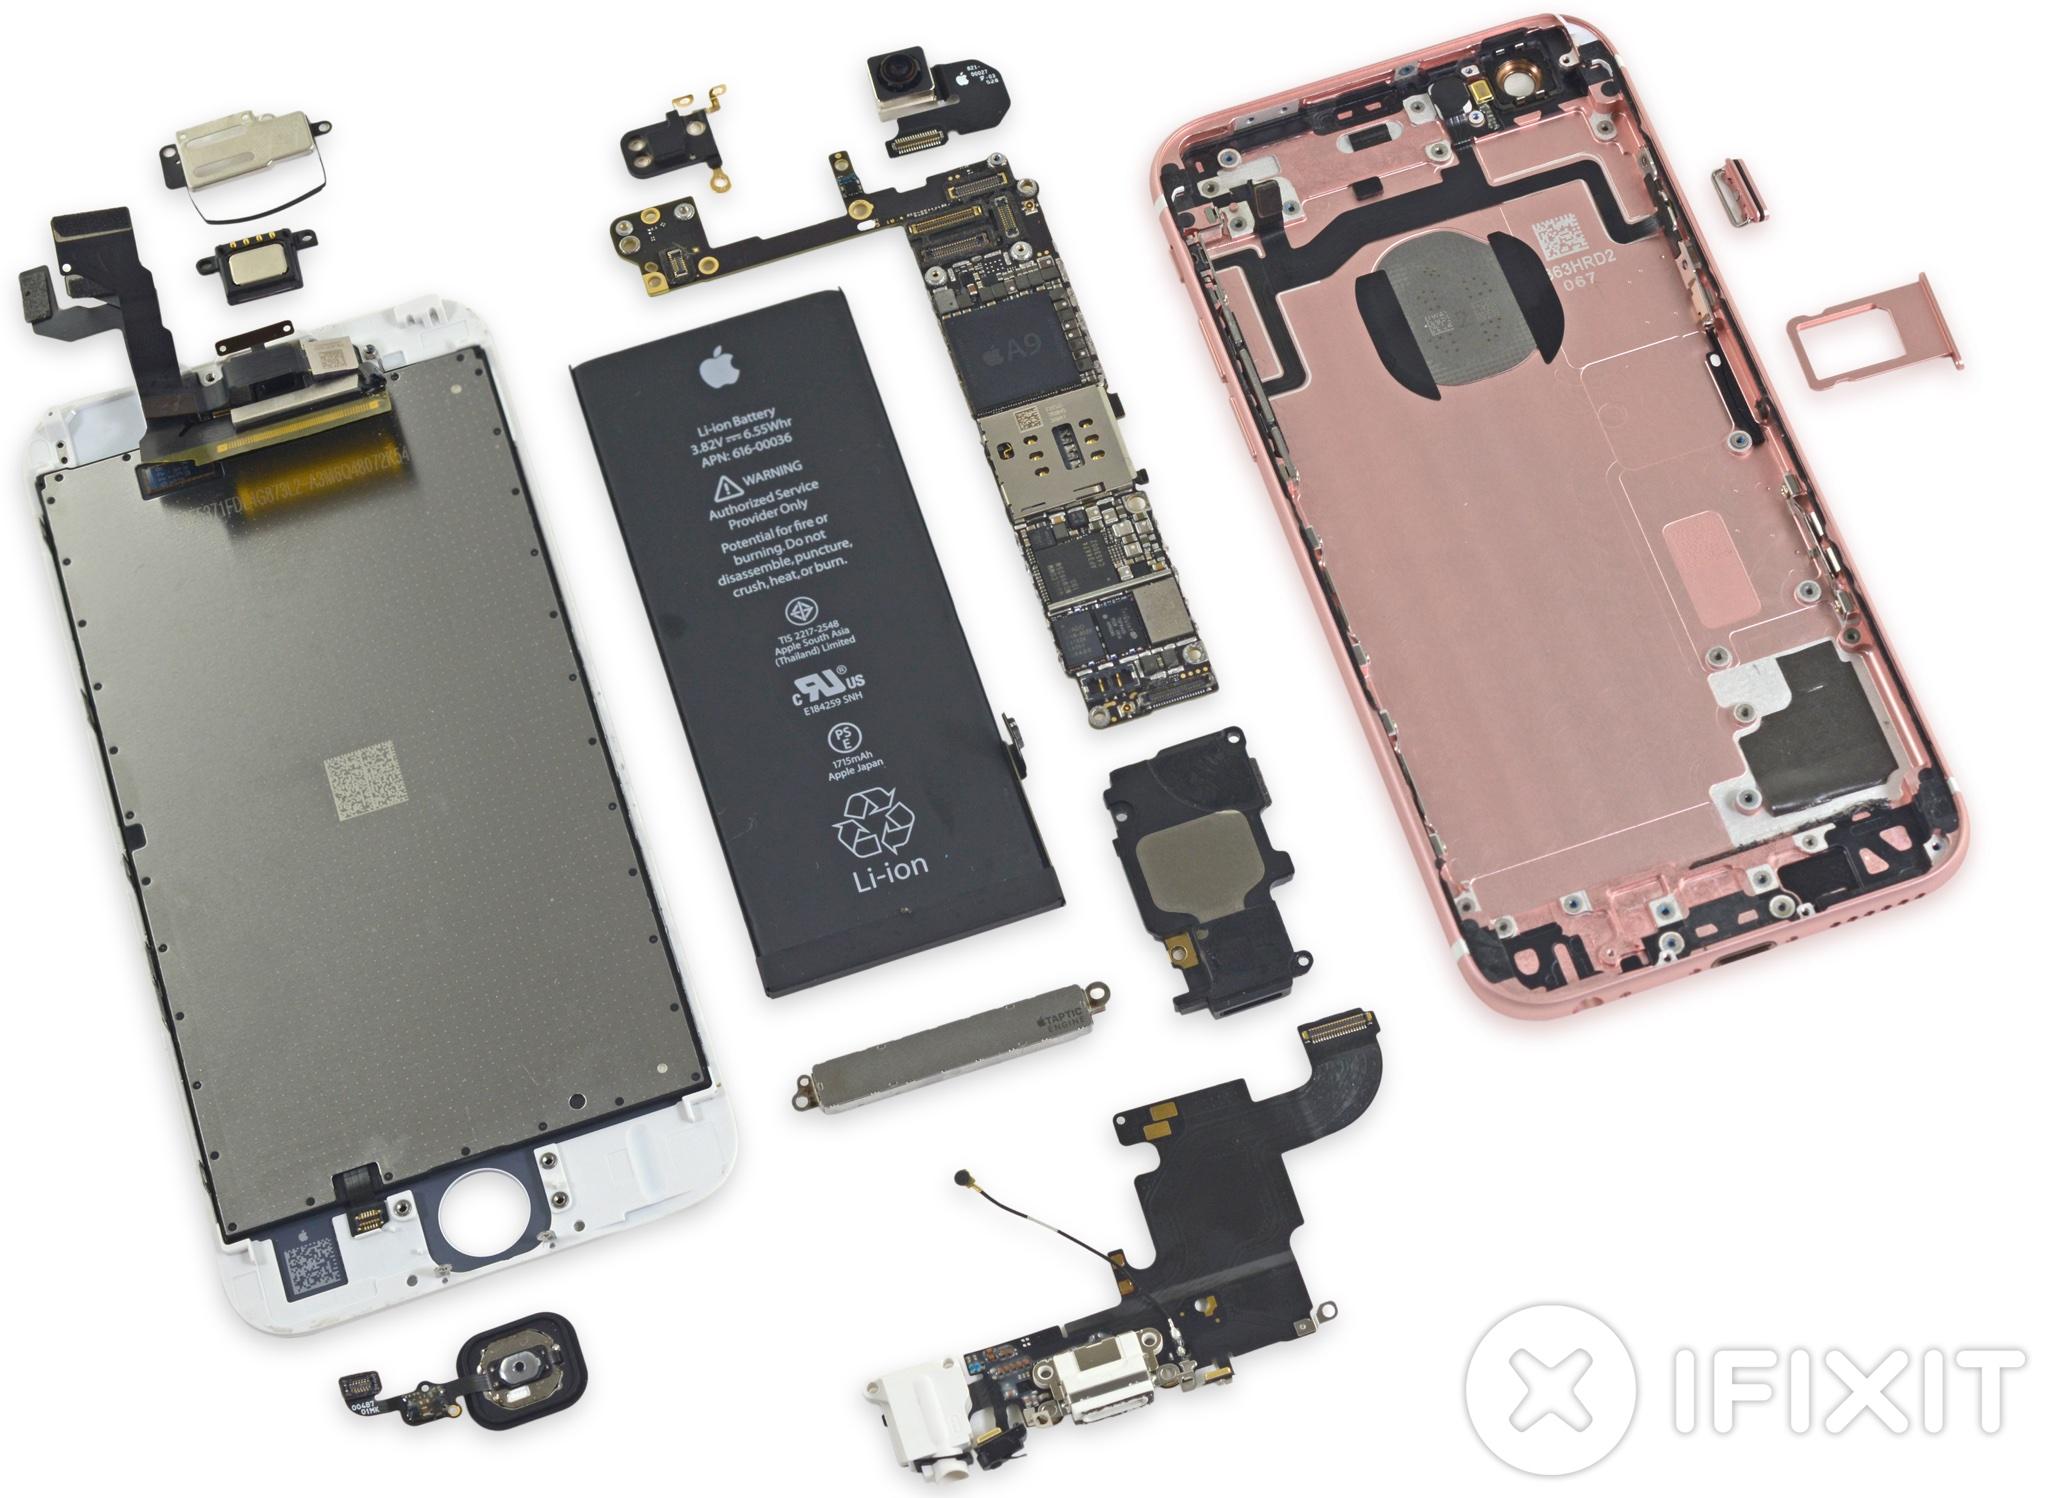 sports shoes 9e143 3bde4 iPhone 6s teardown: smaller battery, heavier display, fewer chips ...